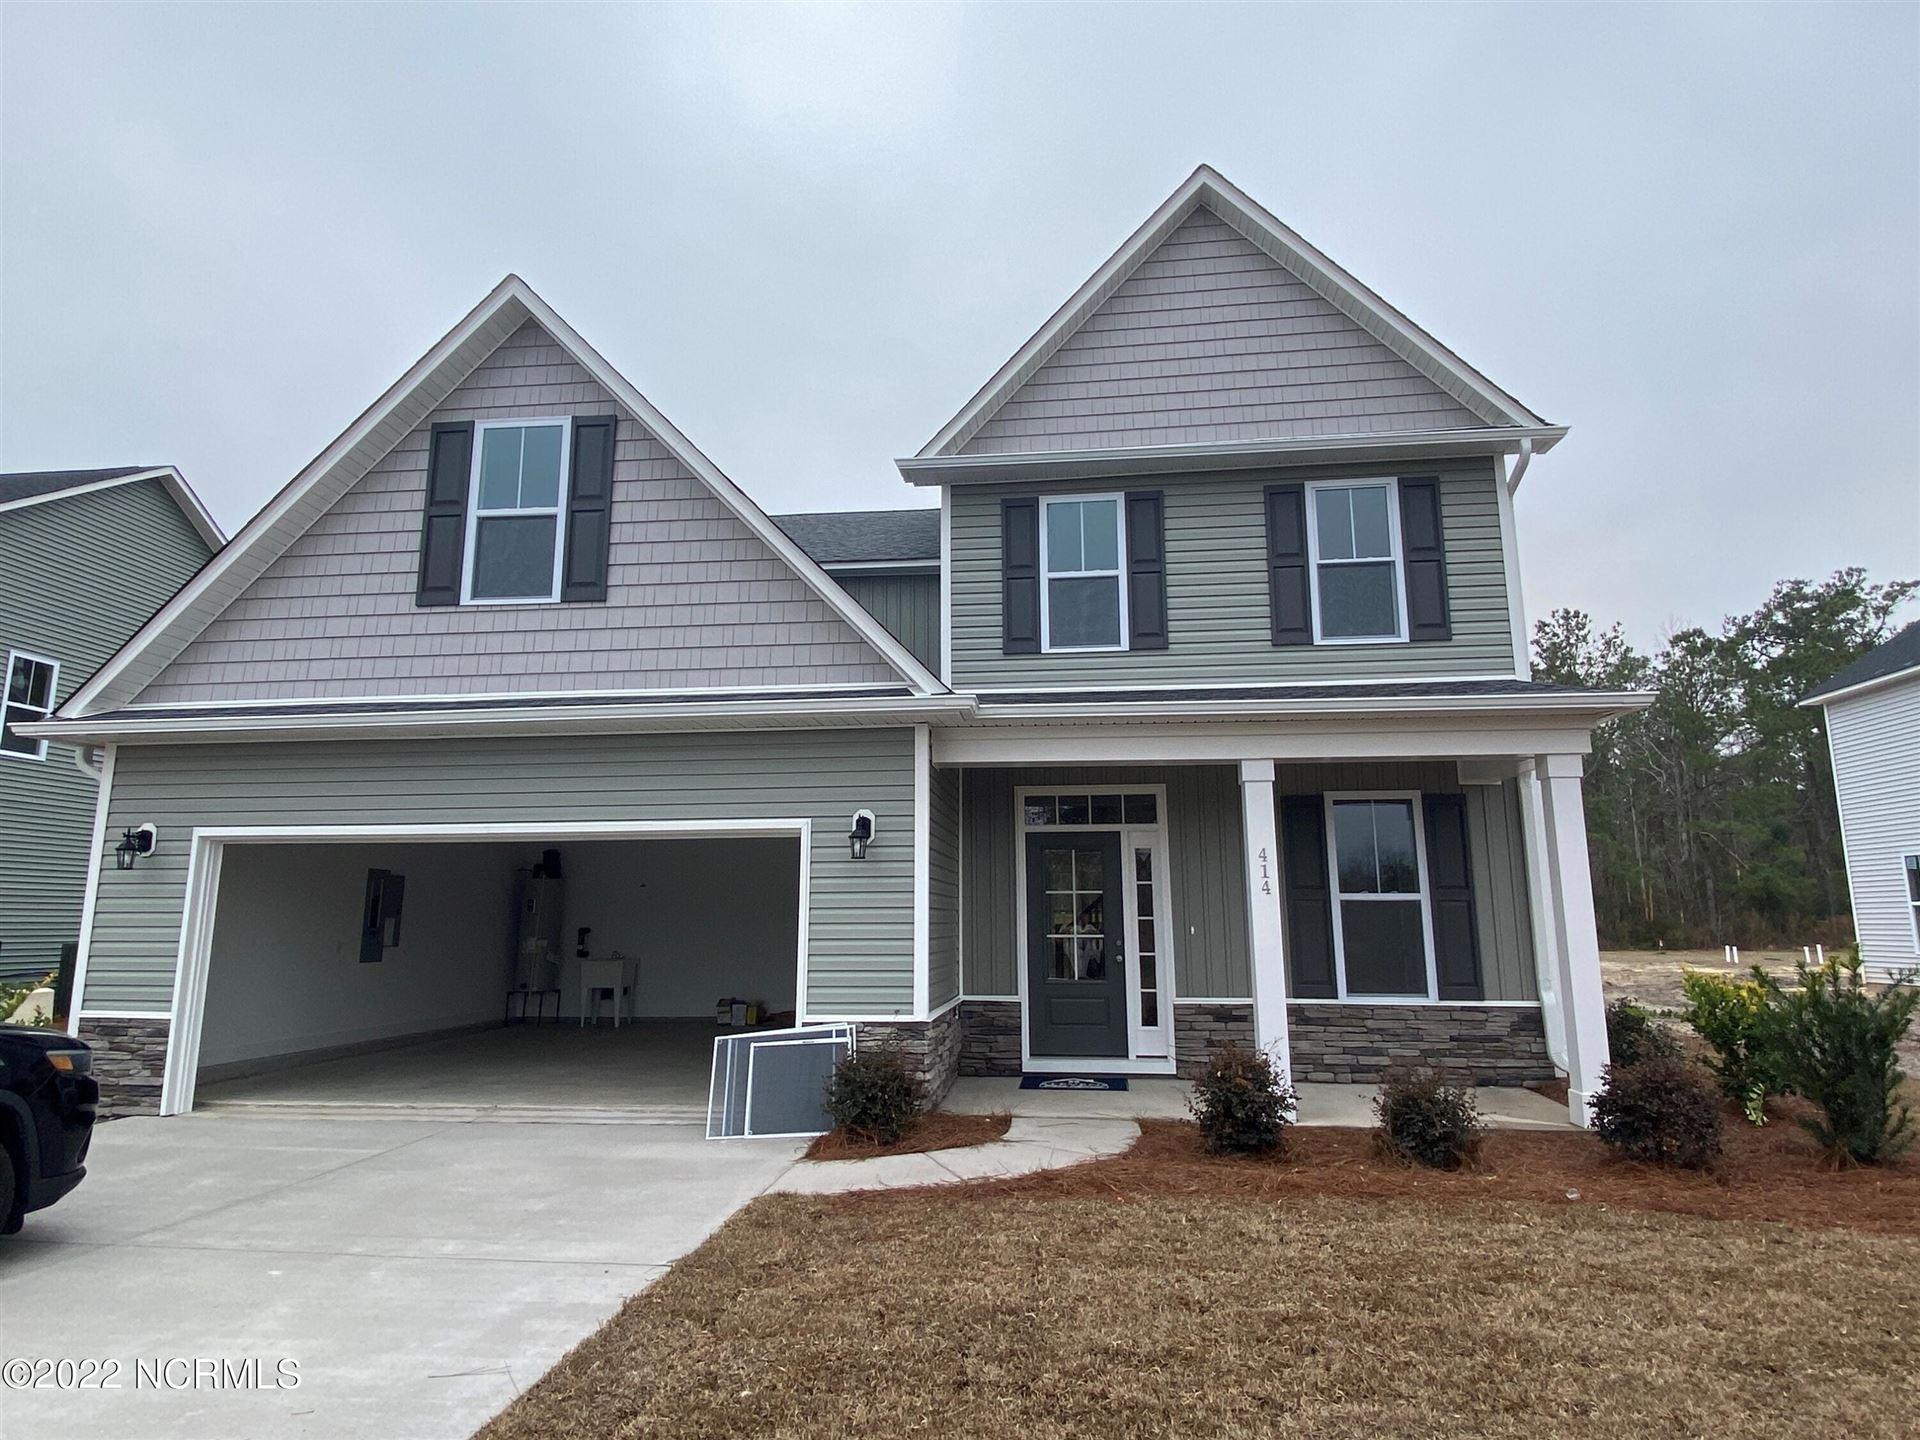 Photo of 415 Grandview Drive, Hampstead, NC 28443 (MLS # 100296200)